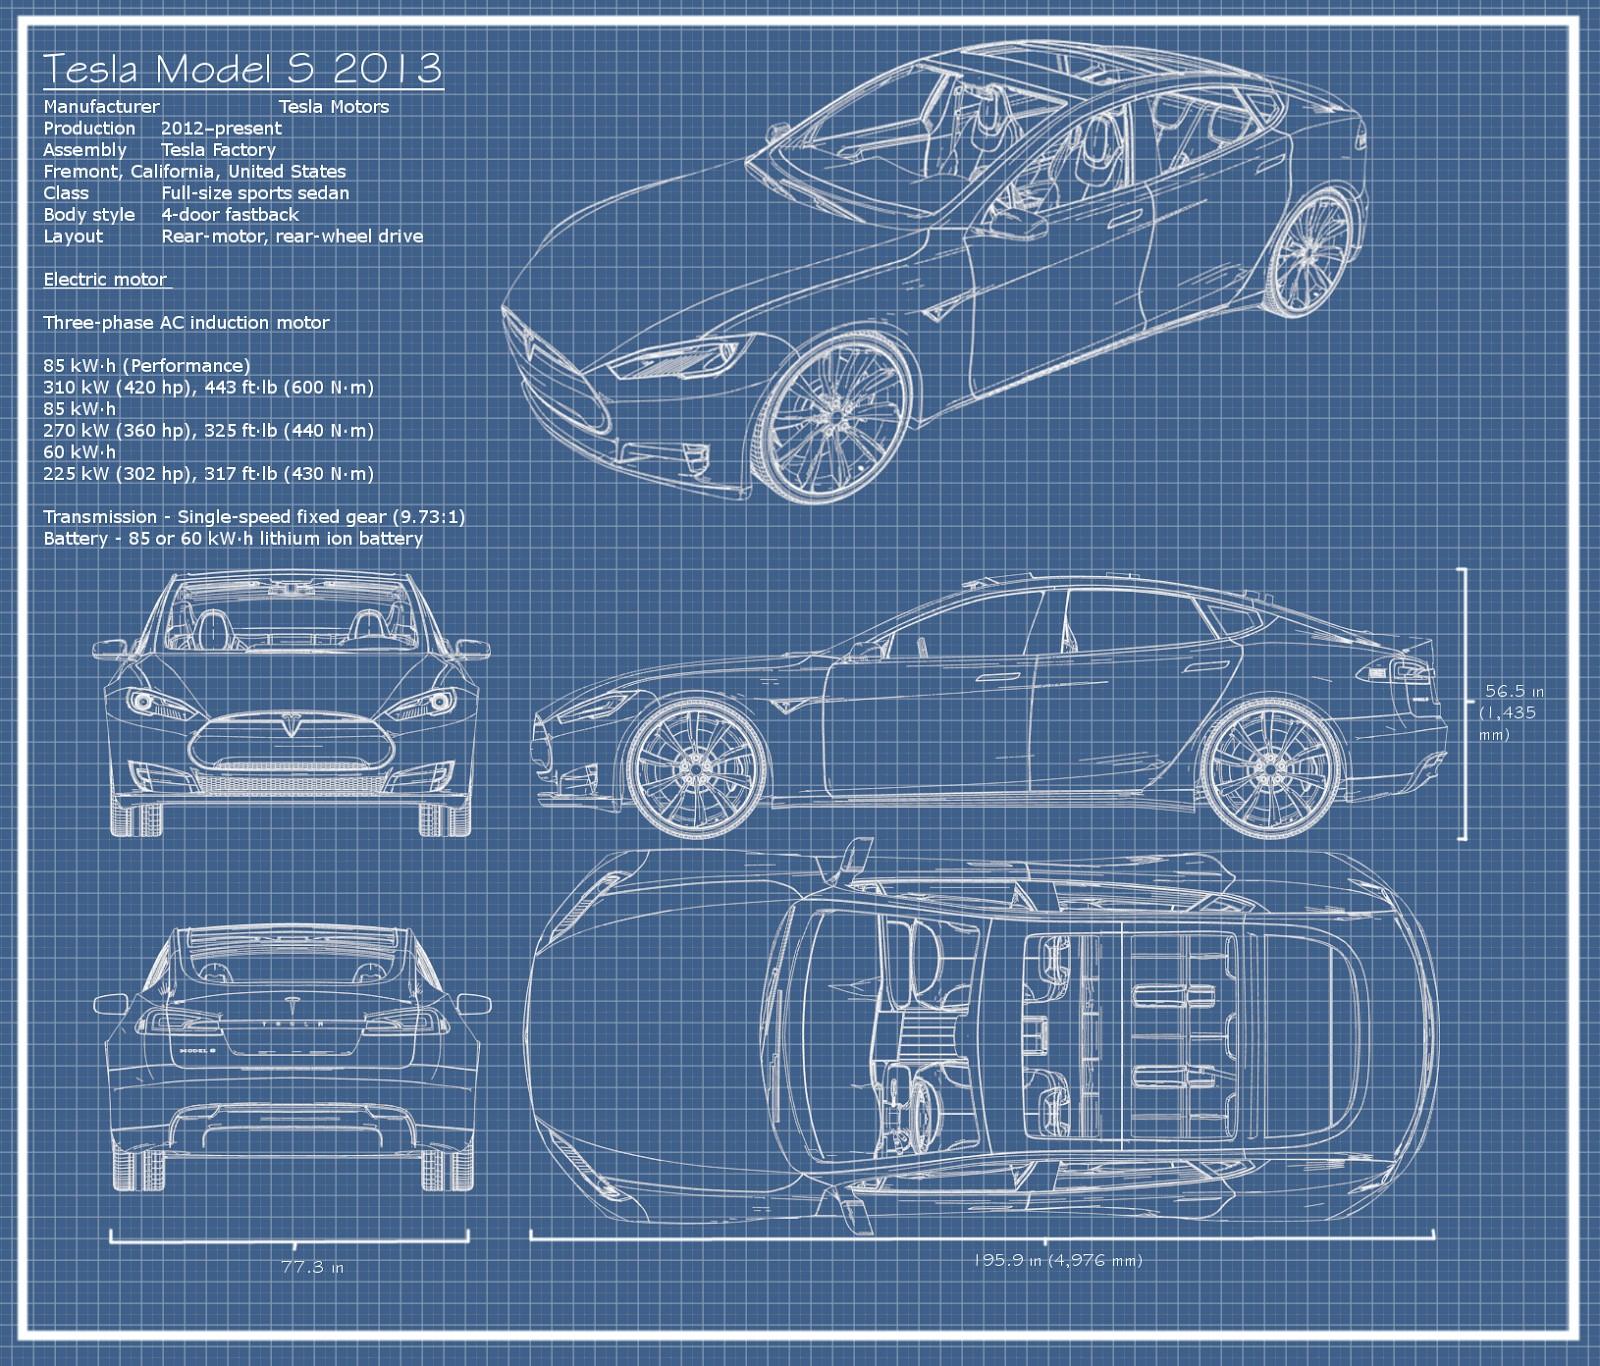 Tesla Battery Diagram Mclaren P1 is the Future In Electric the New Tesla Model S Has Of Tesla Battery Diagram